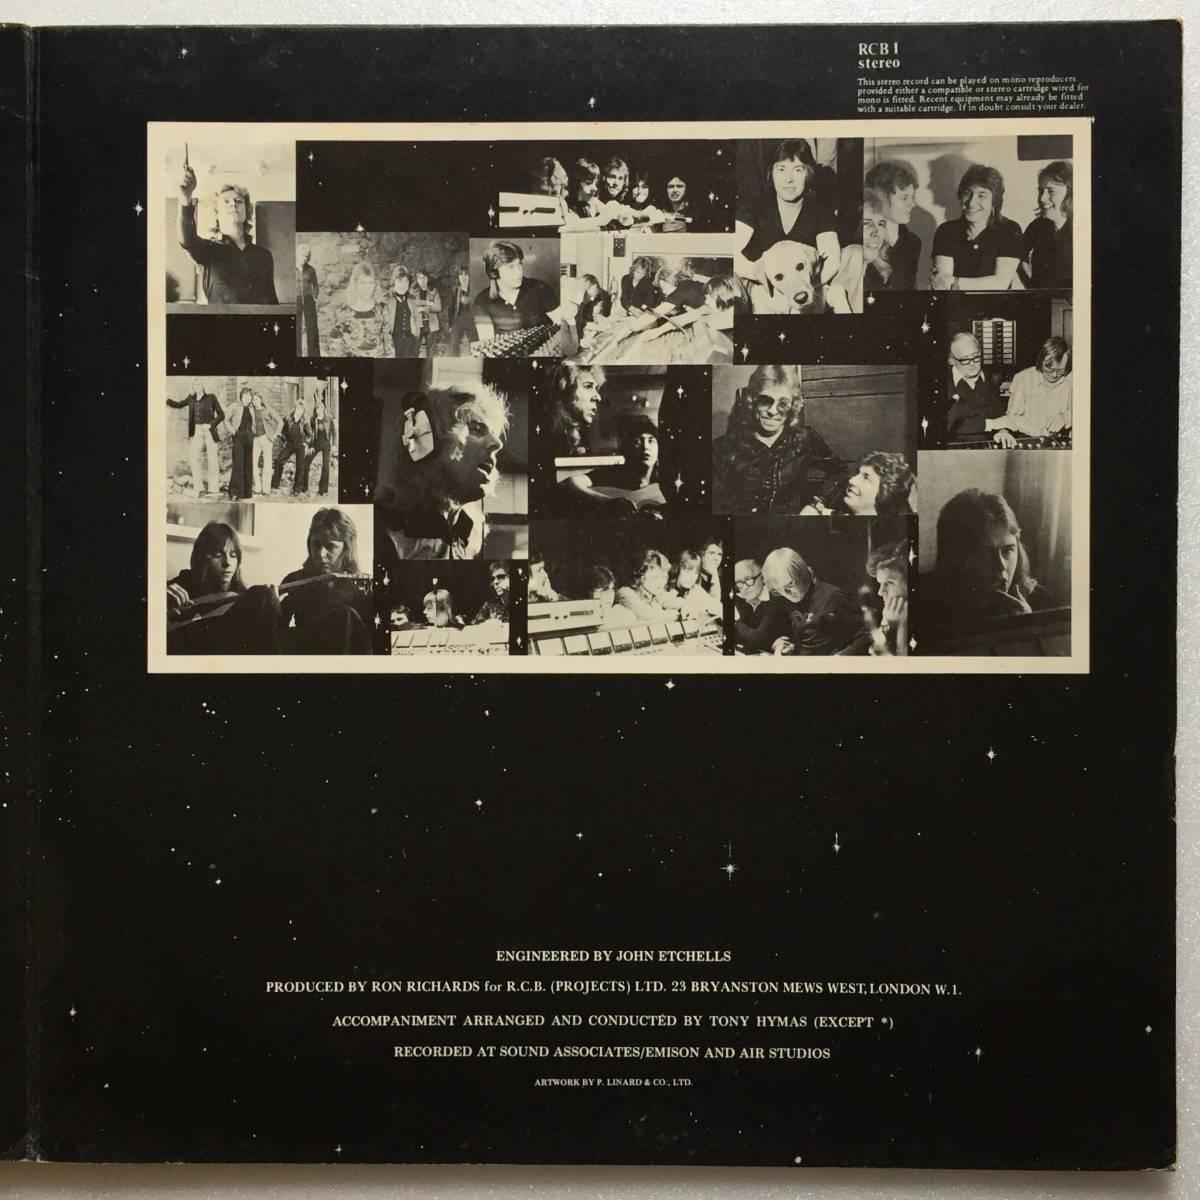 CIRKUS 「ONE」UK ORIGINAL RCB(PROJECTS)LTD. RCB 1 '73 UK MELLOTRON PROGRESSIVE ROCK 見開きジャケット_画像6